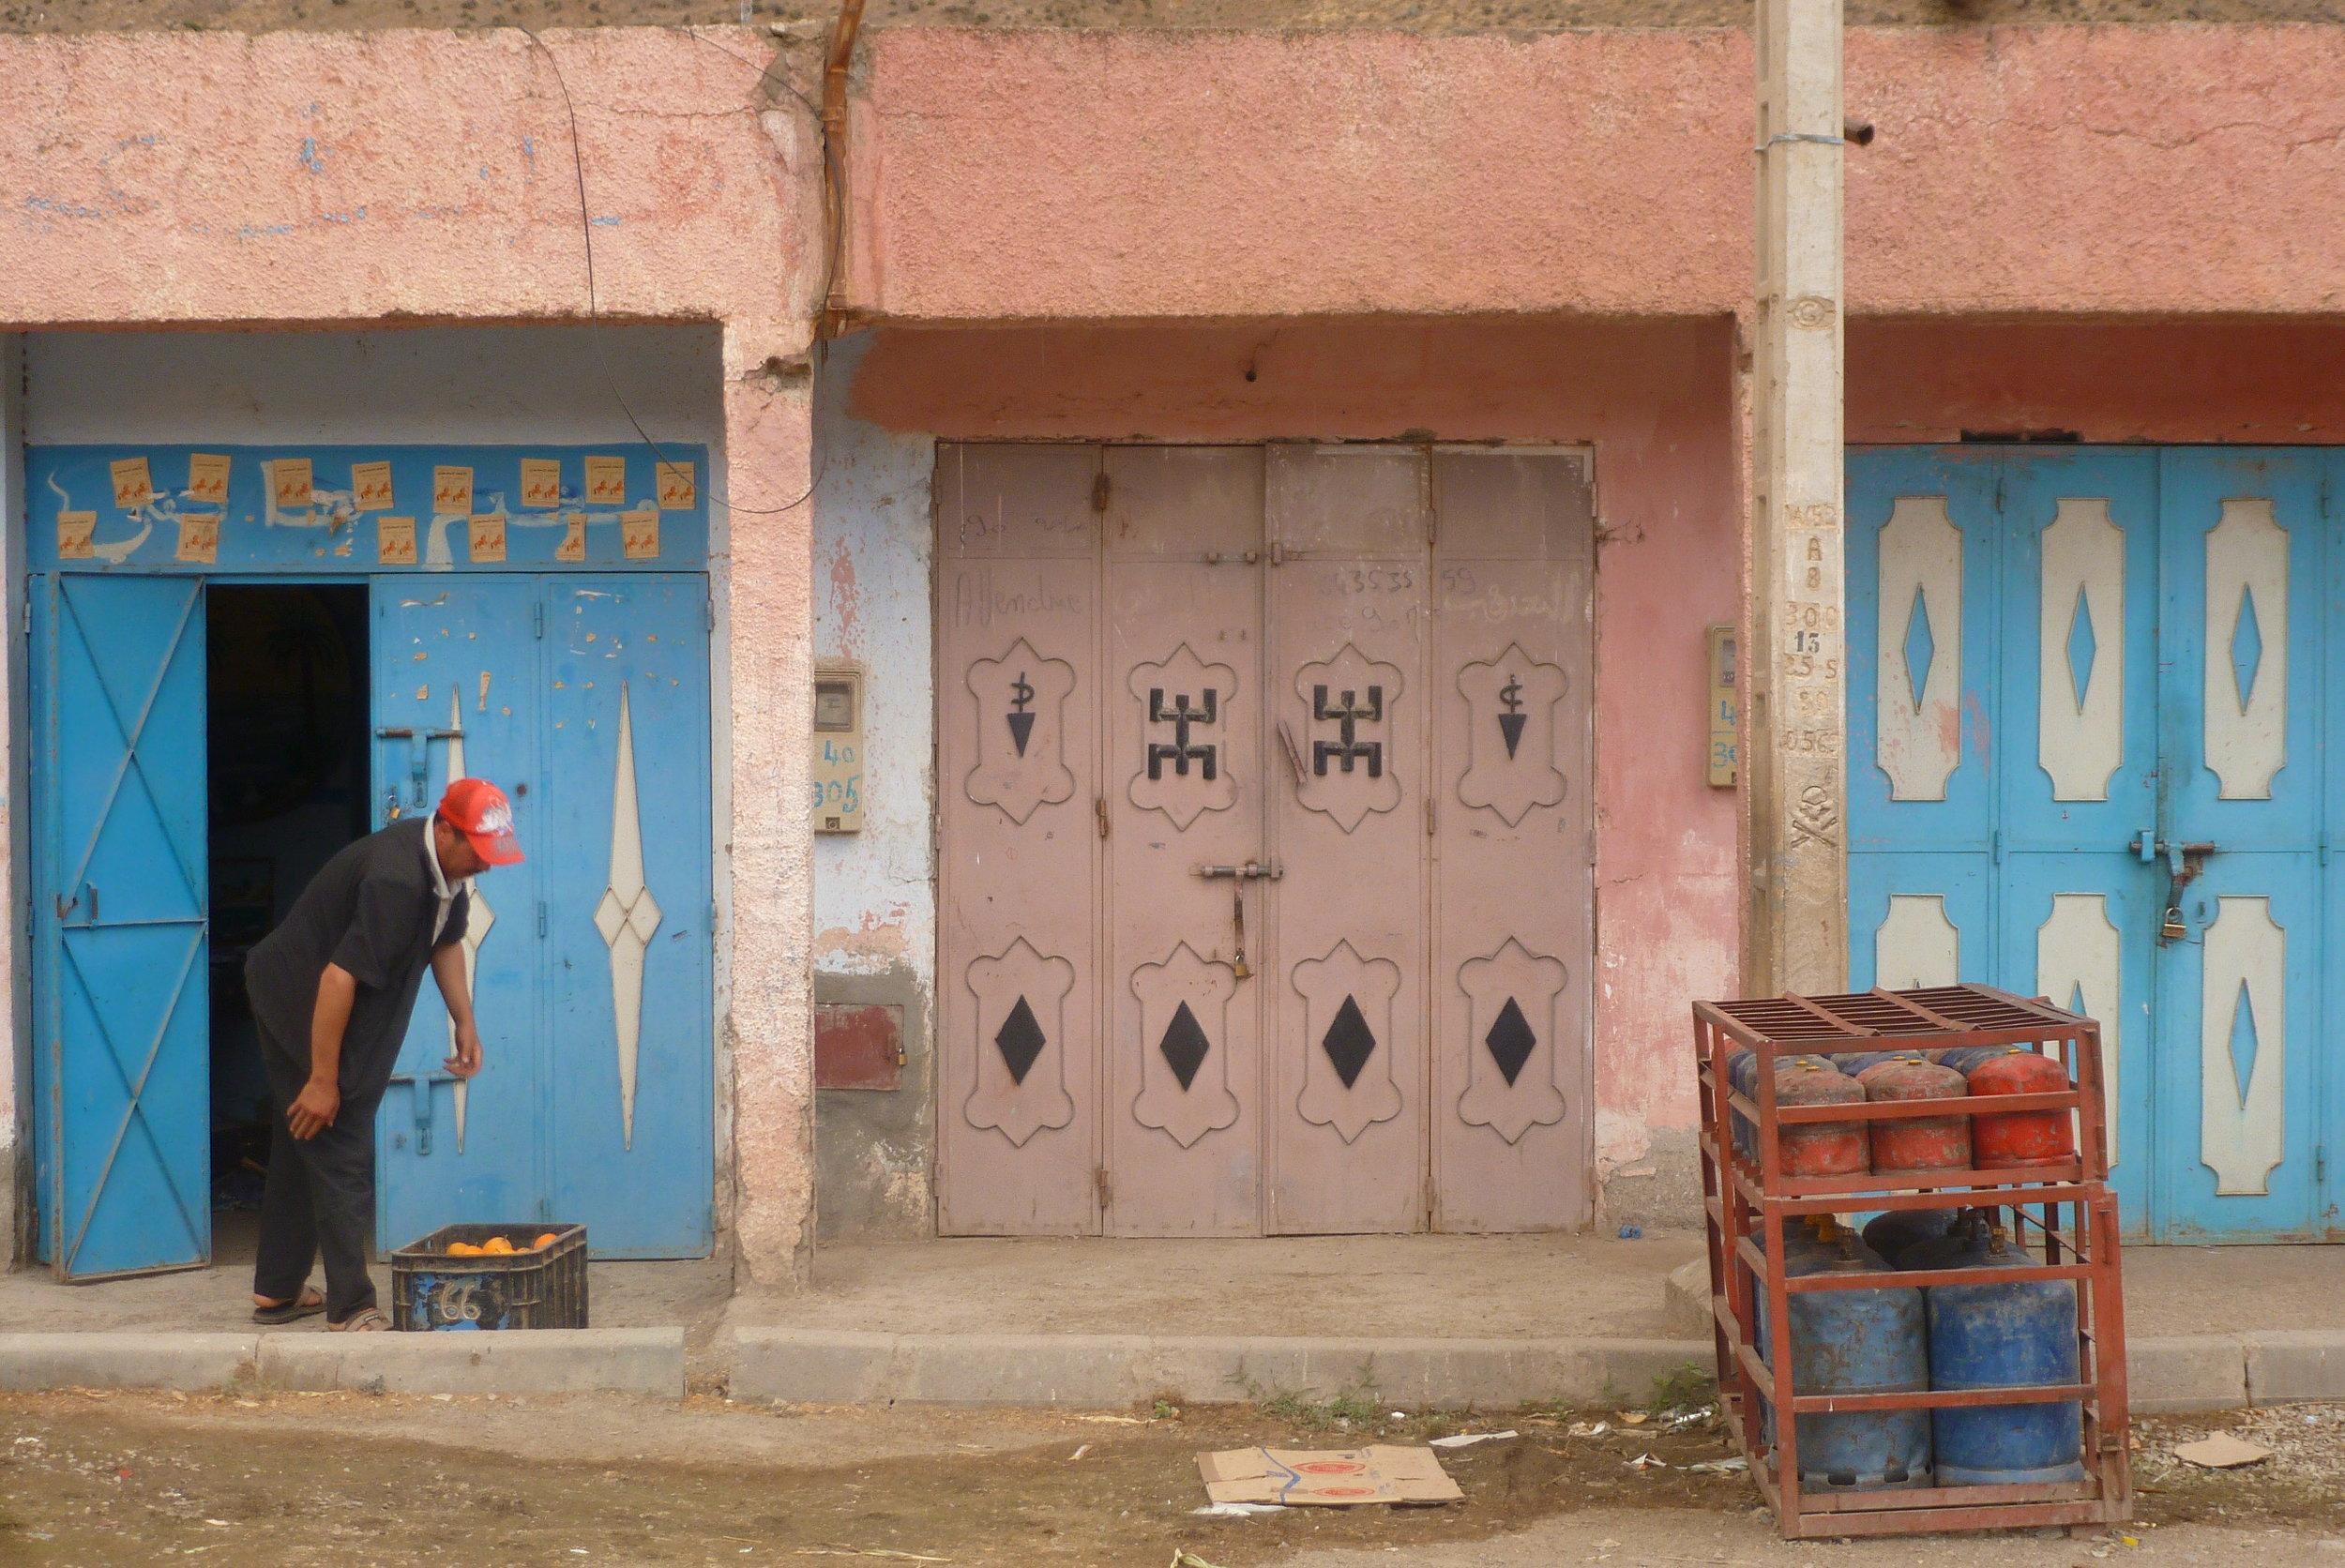 Amazigh symbols decorate a steel door in a Berber village.